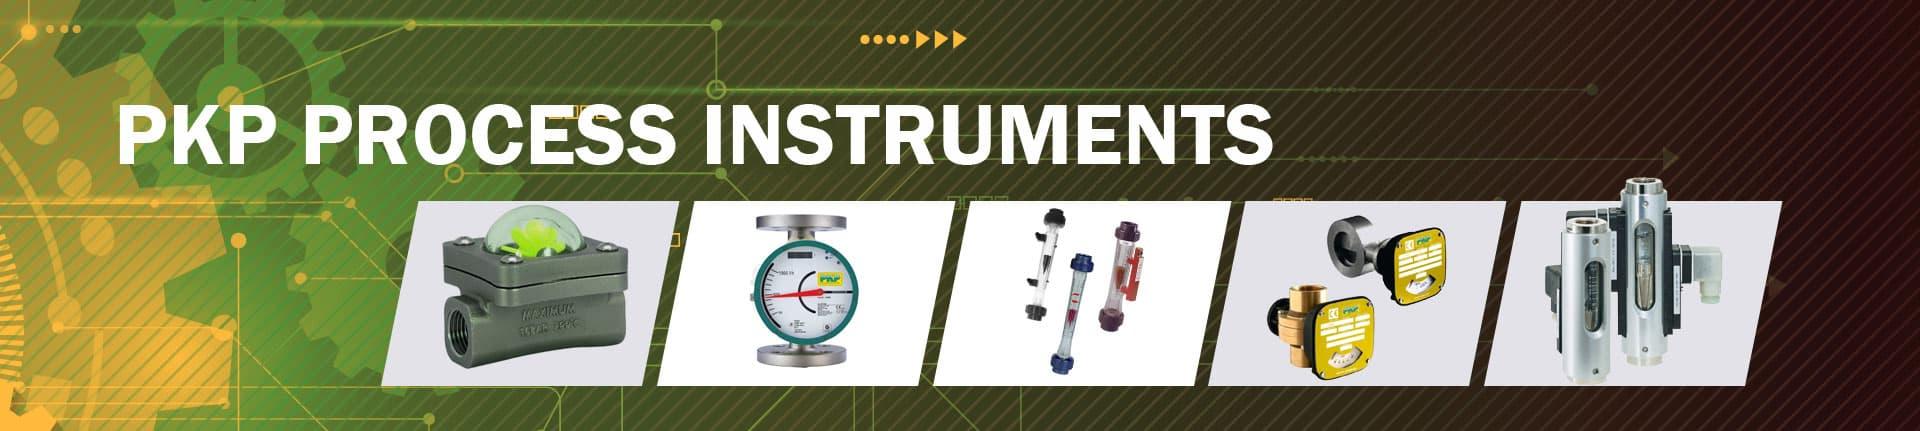 PKP-instruments-sm